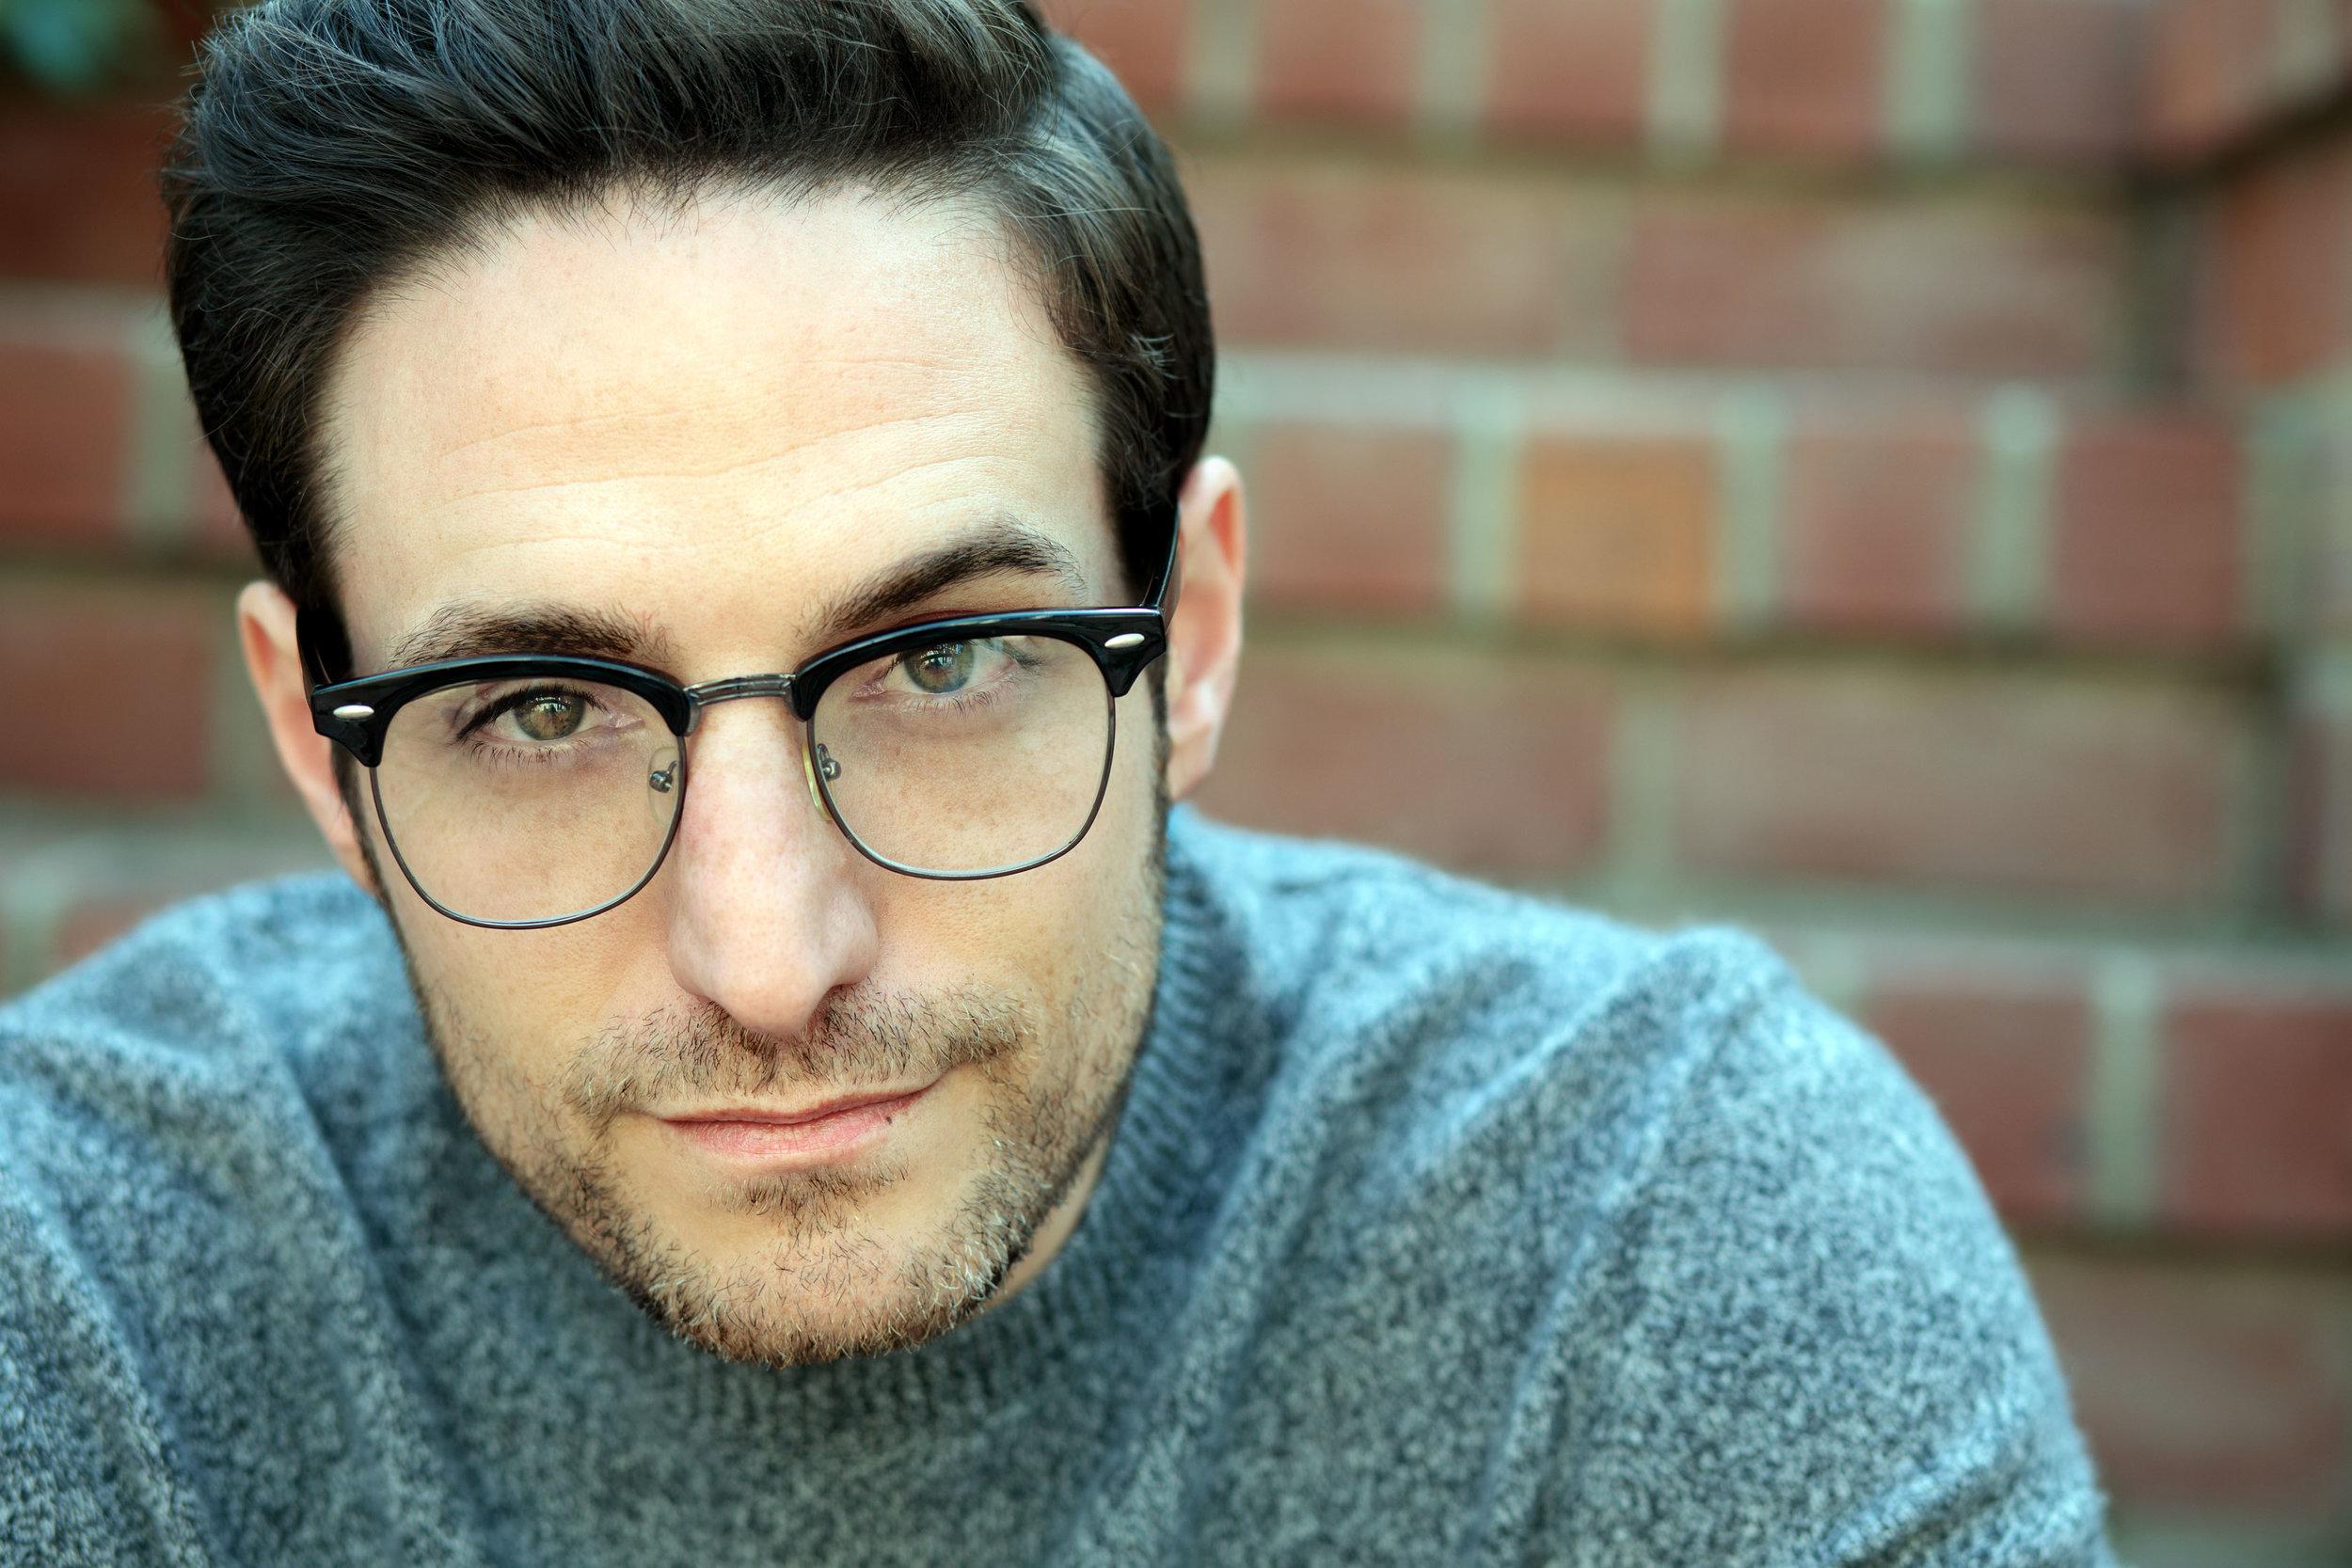 jill-headshots-45---grey-sweater-glasses---retouched.jpg